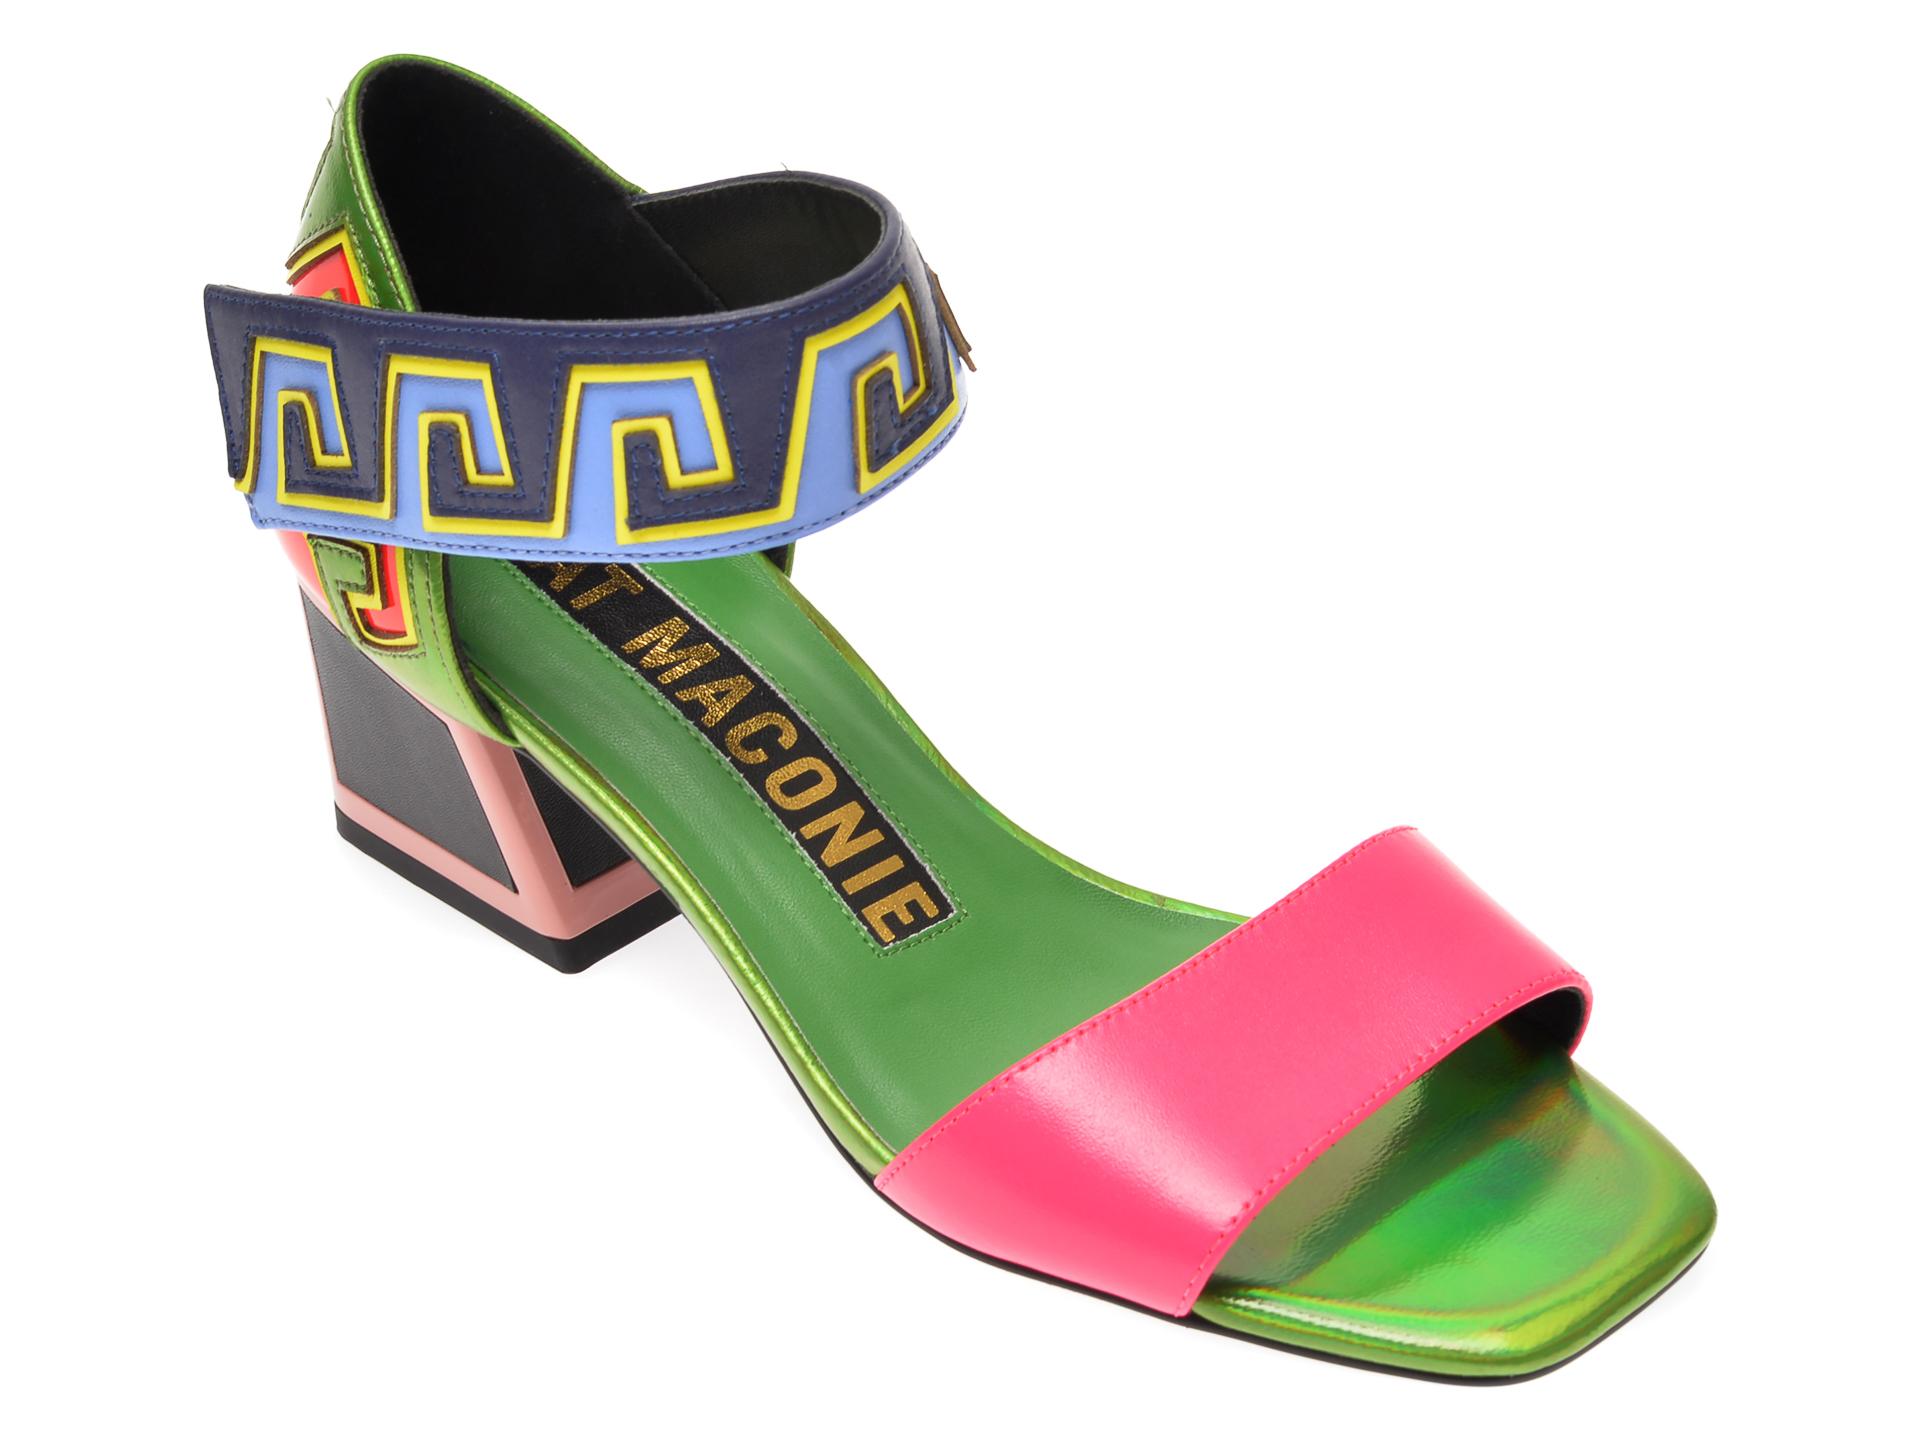 Sandale KAT MACONIE multicolor, DYLANA, din piele naturala